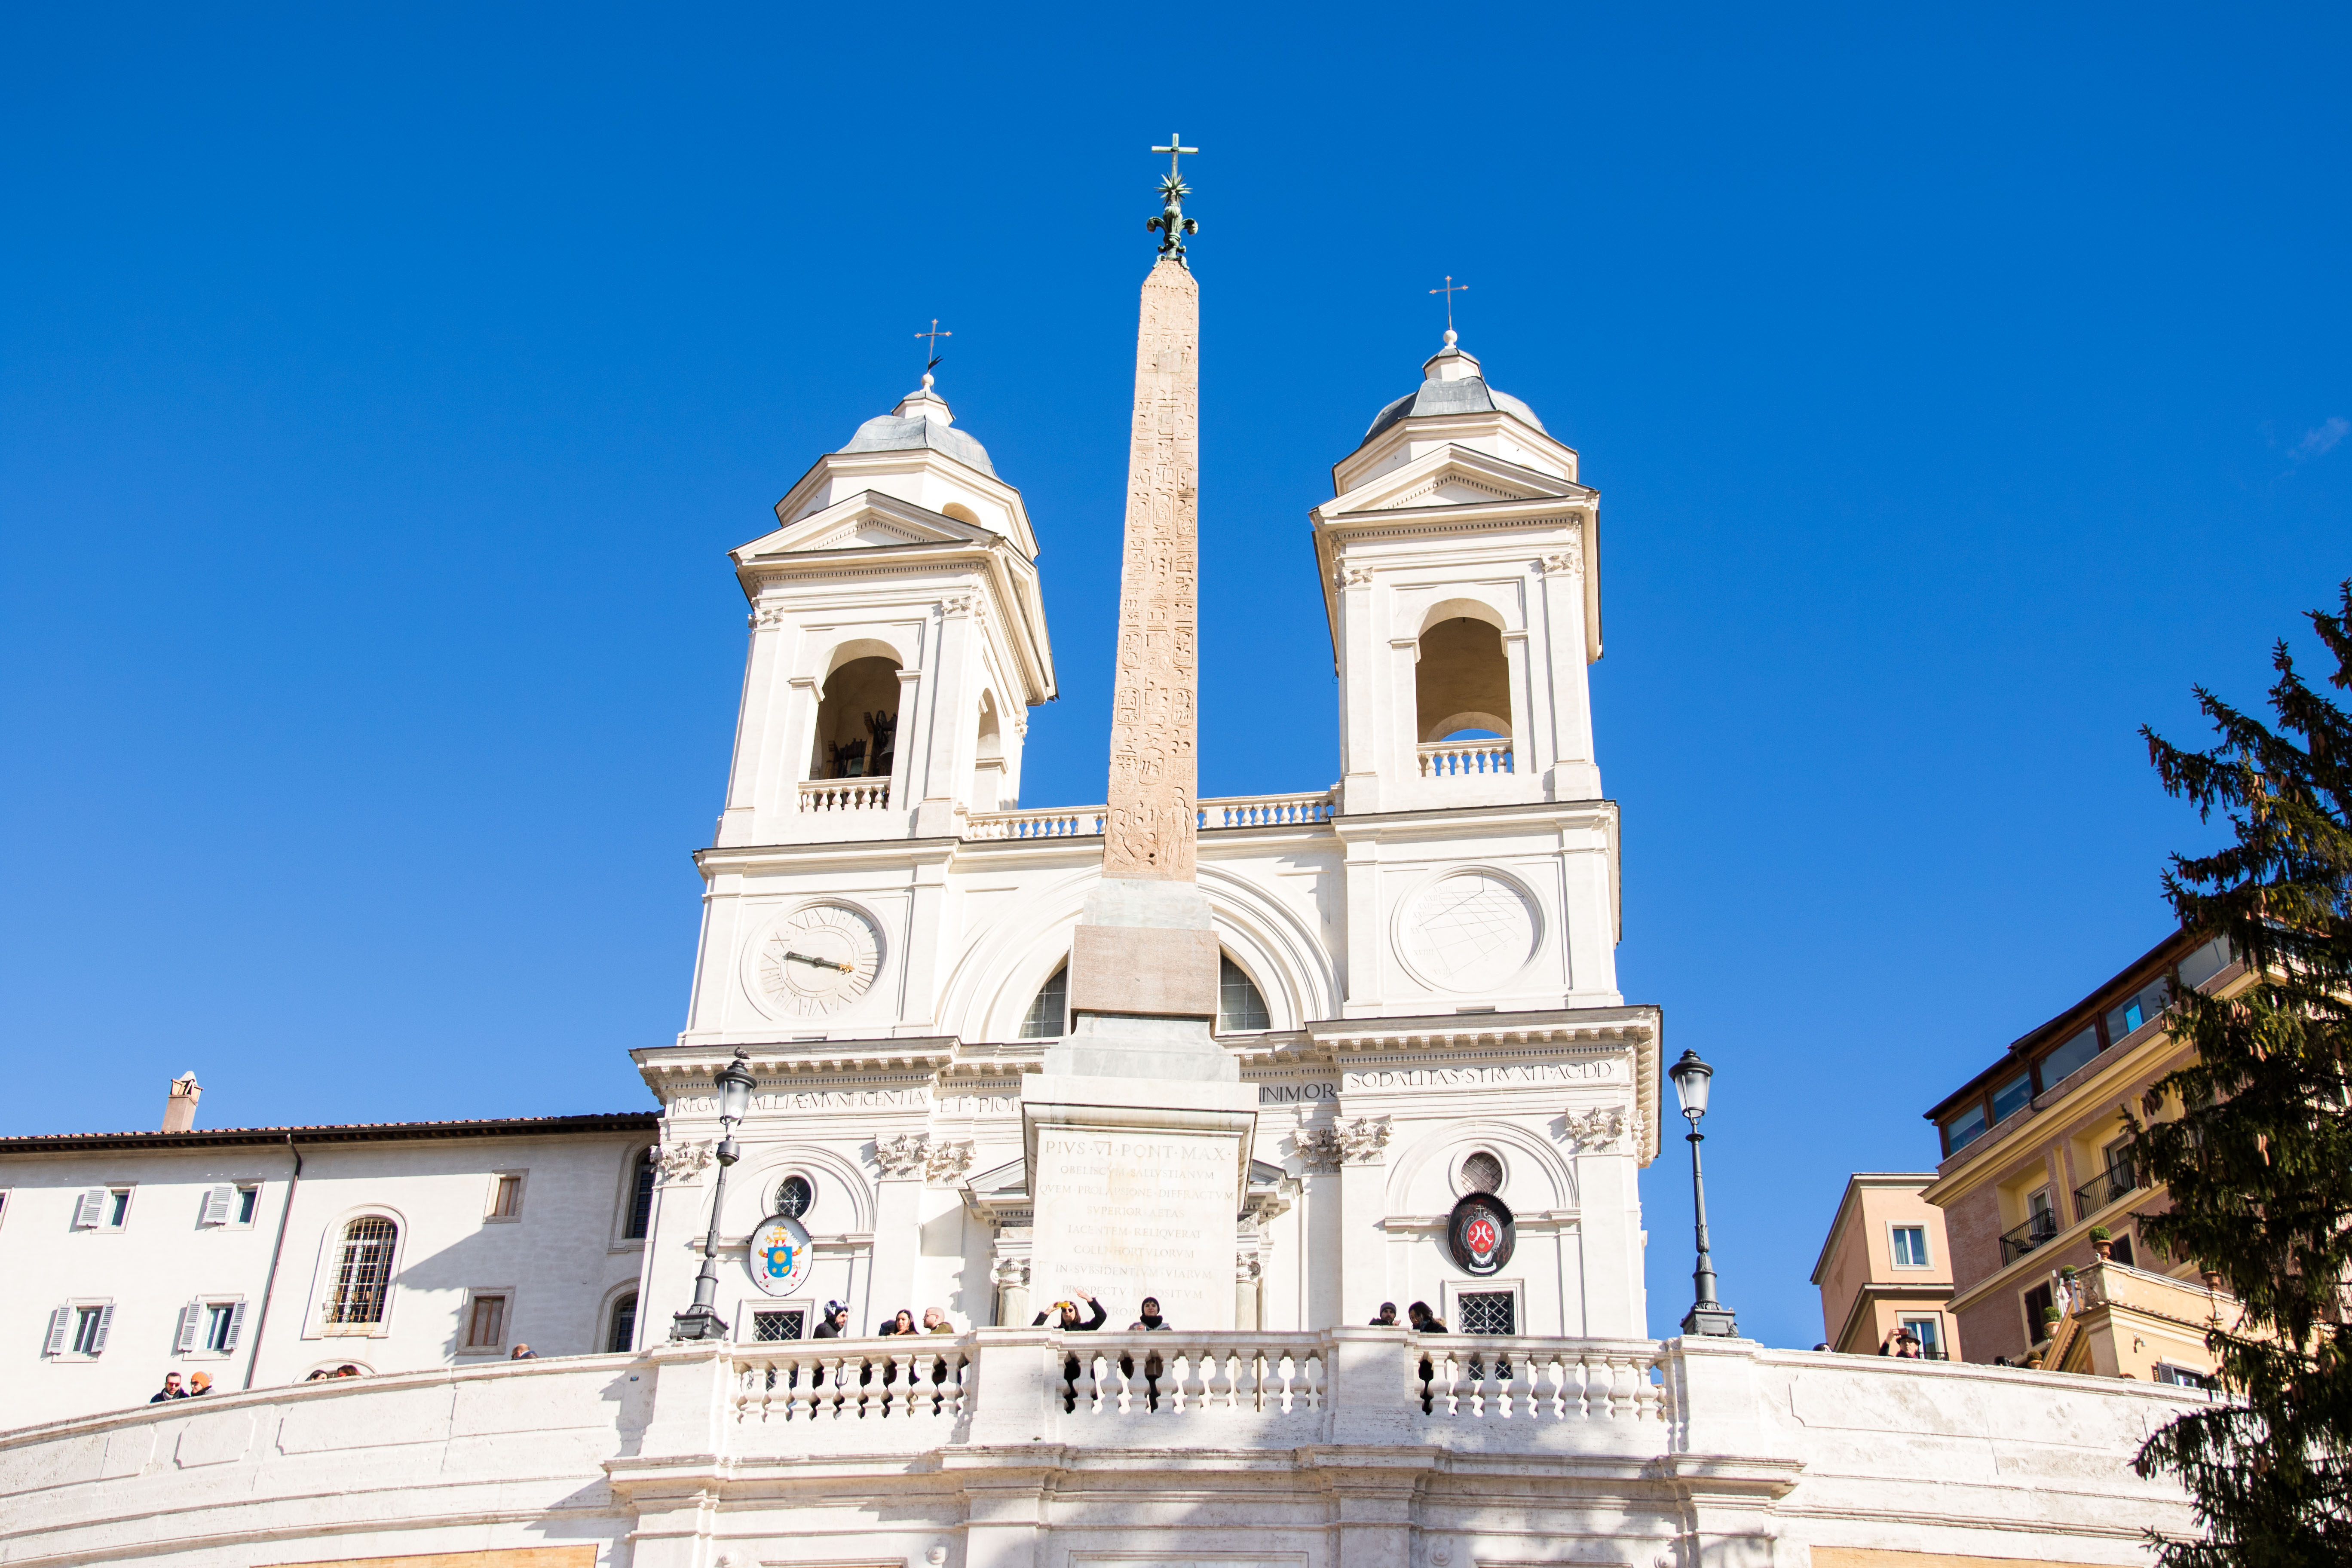 Spanish Steps Piazza di Spagna Rome Italy